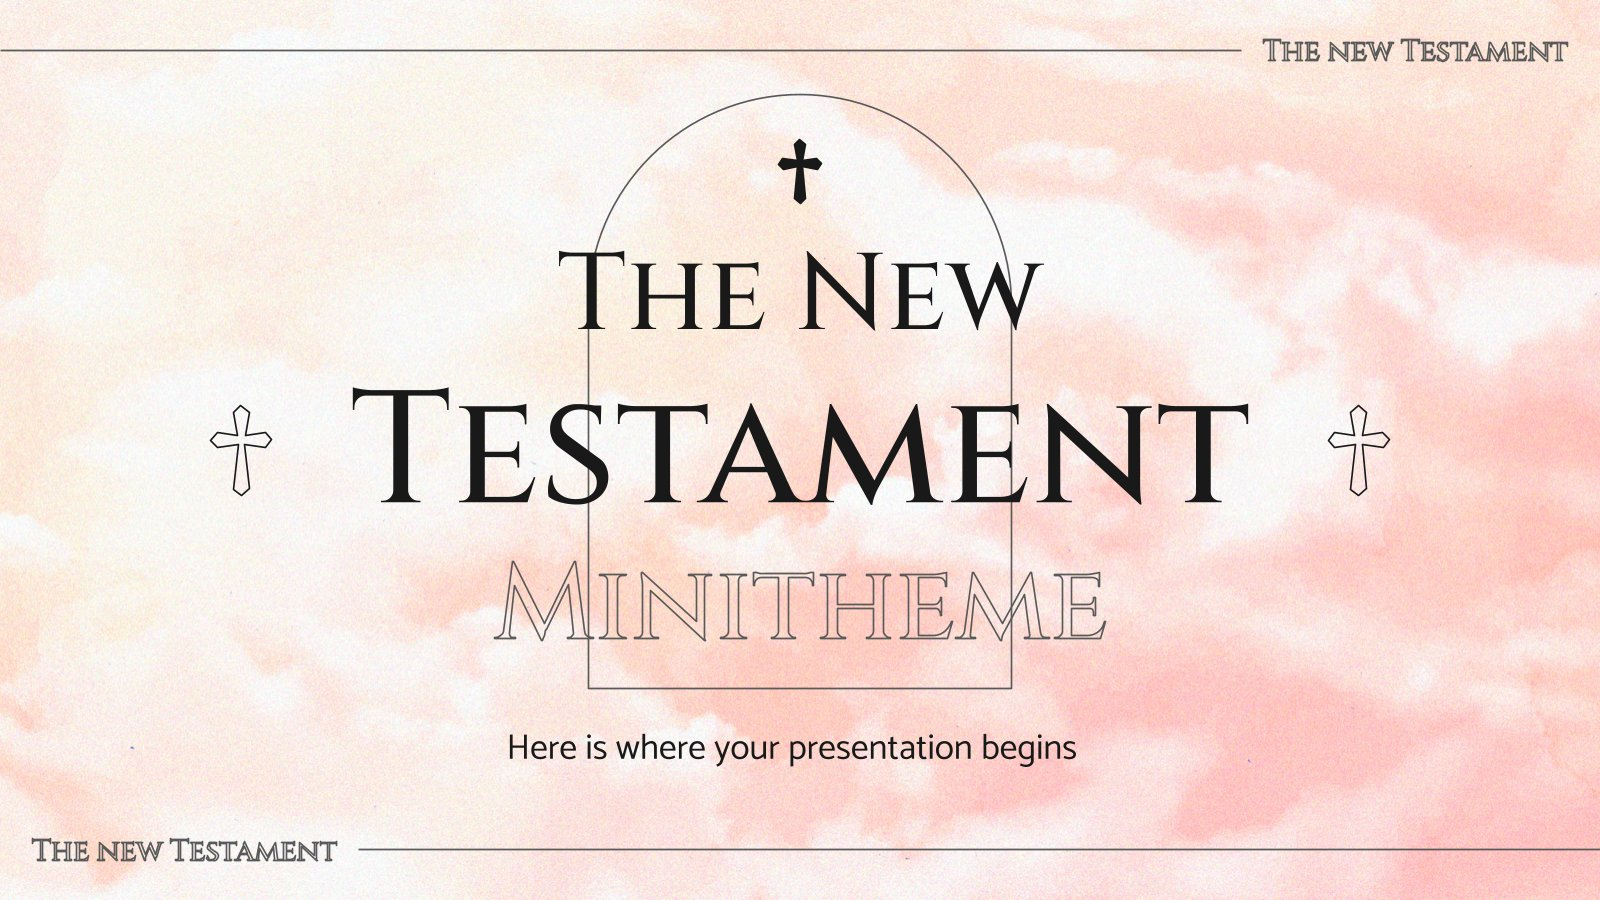 The New Testament Minitheme presentation template